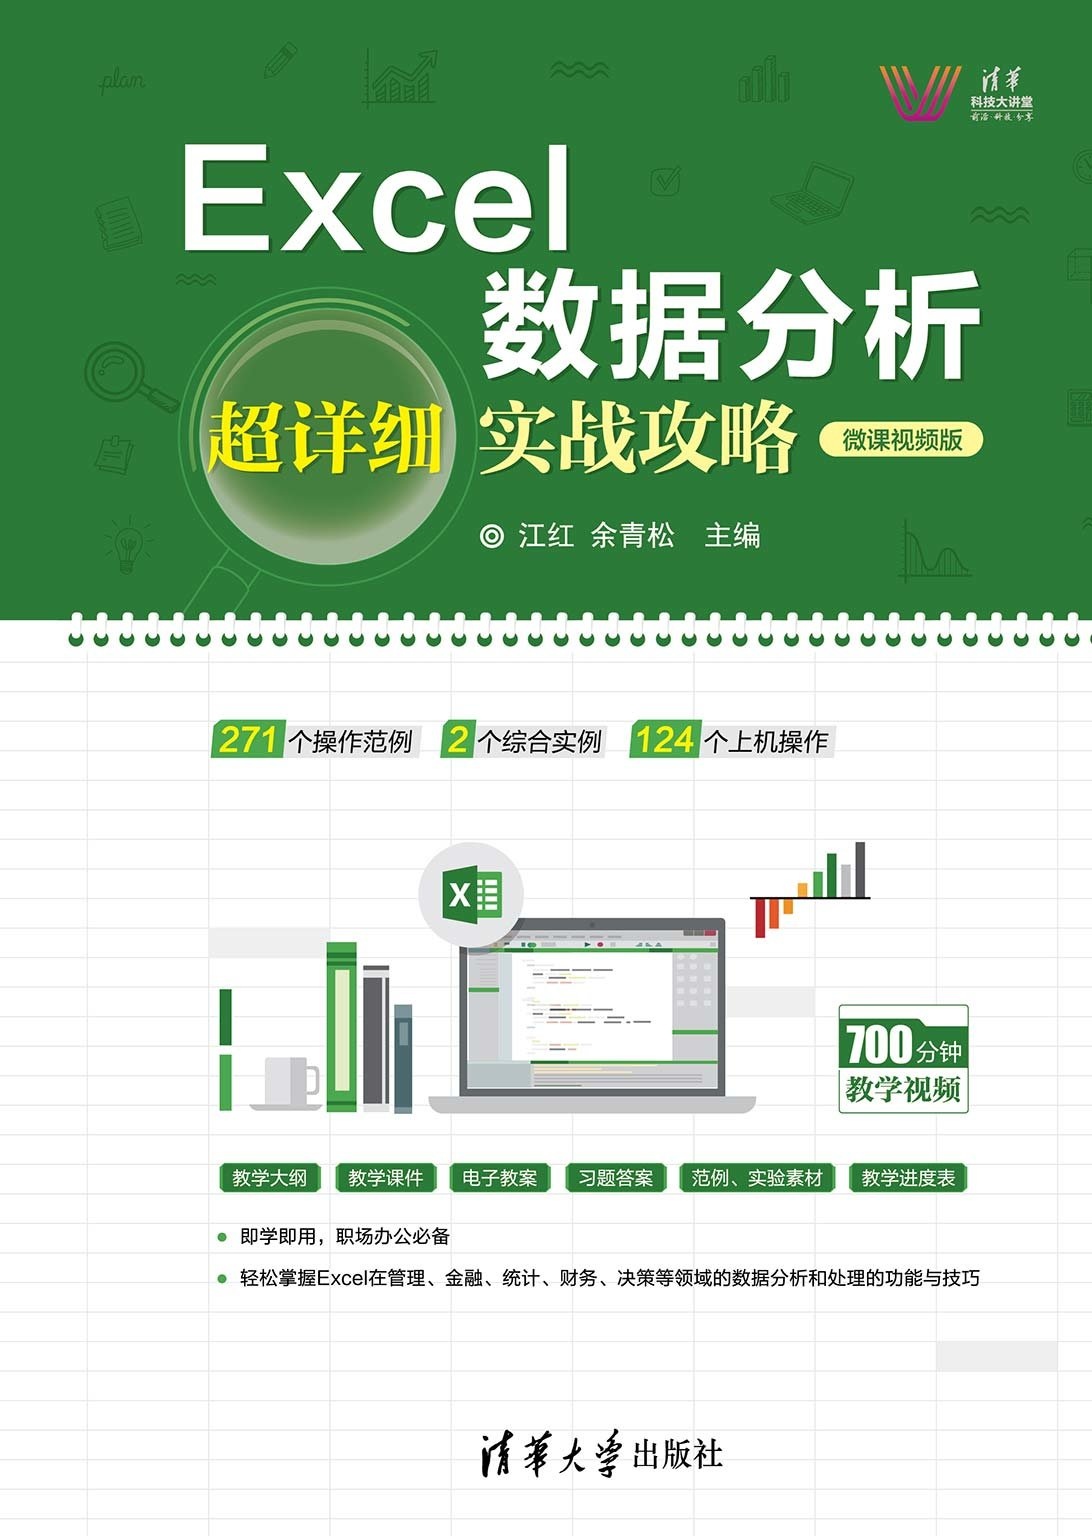 Excel數據分析超詳細實戰攻略-微課視頻版-preview-1